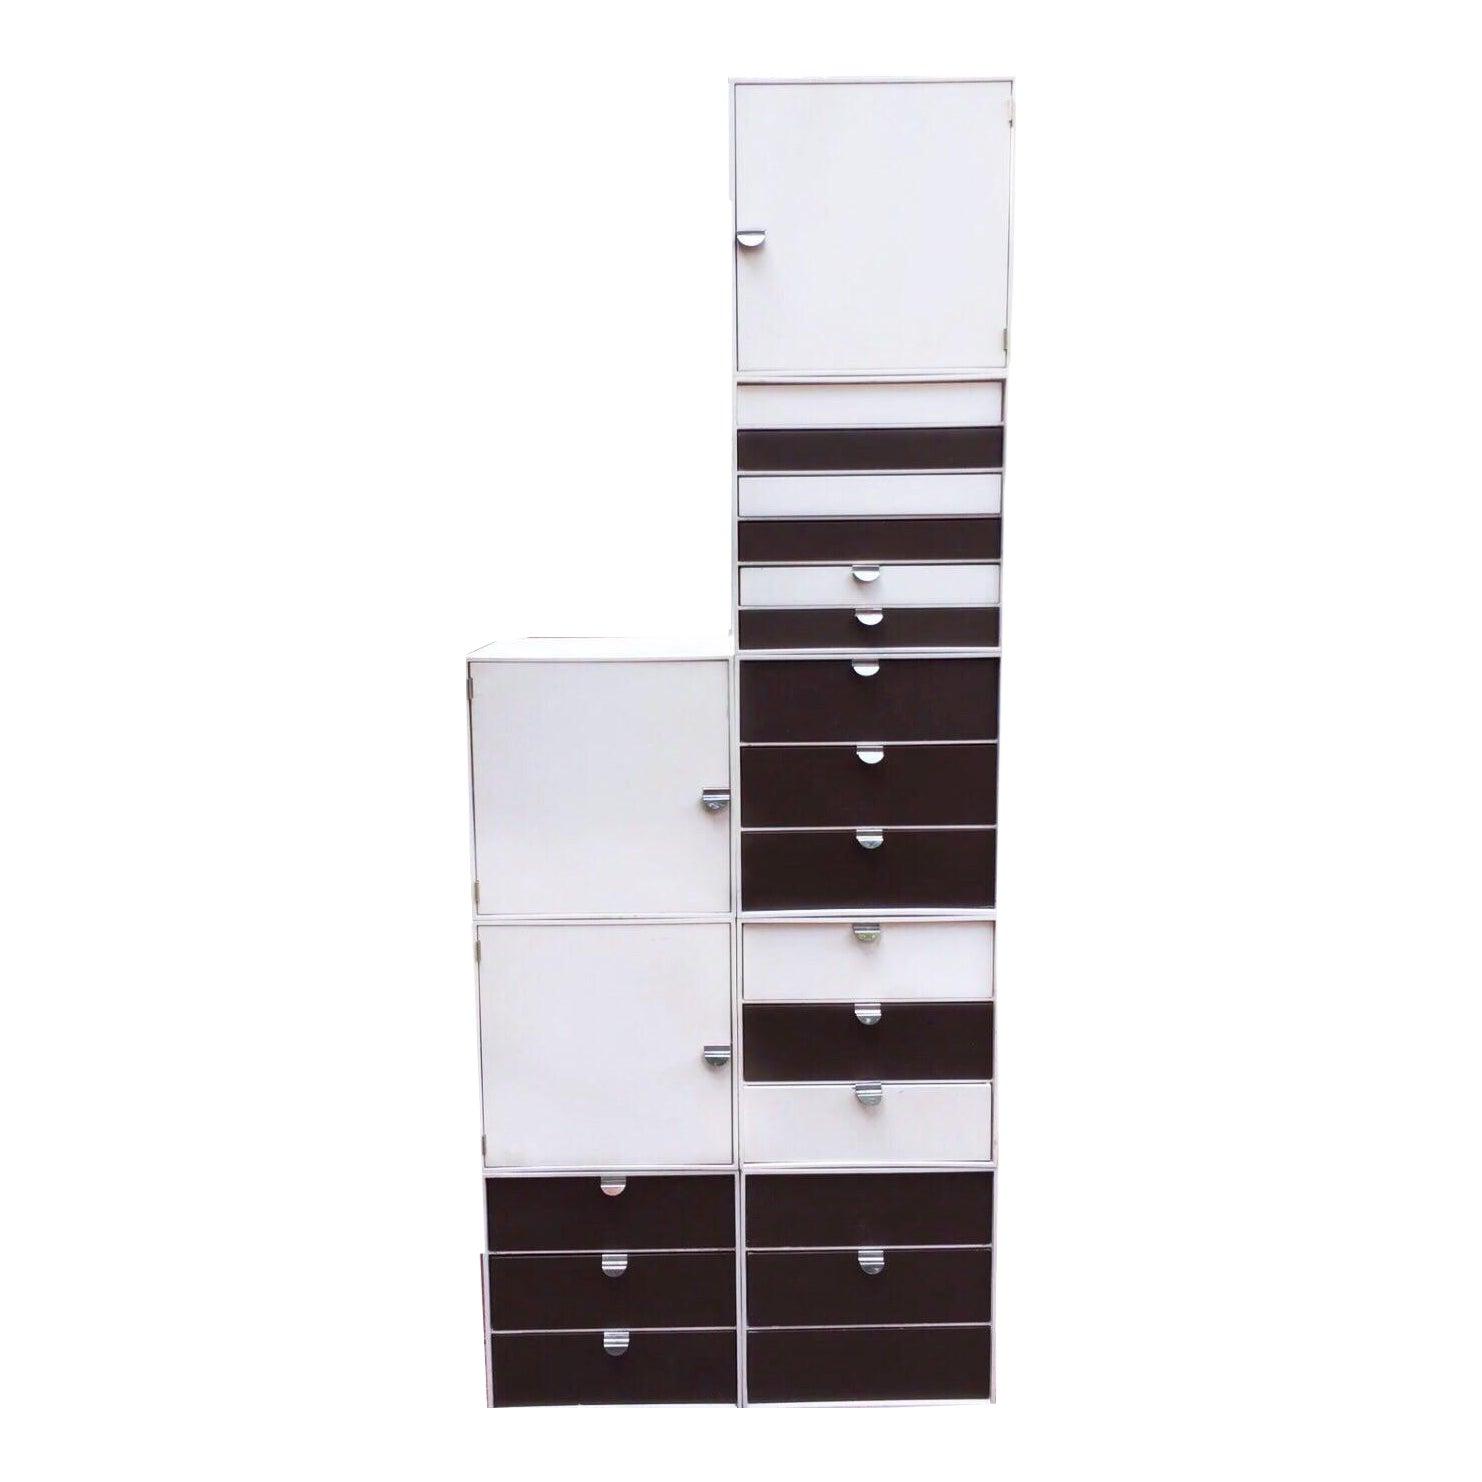 Palaset by r ratia for treston oy finland modular storage cube set chairish